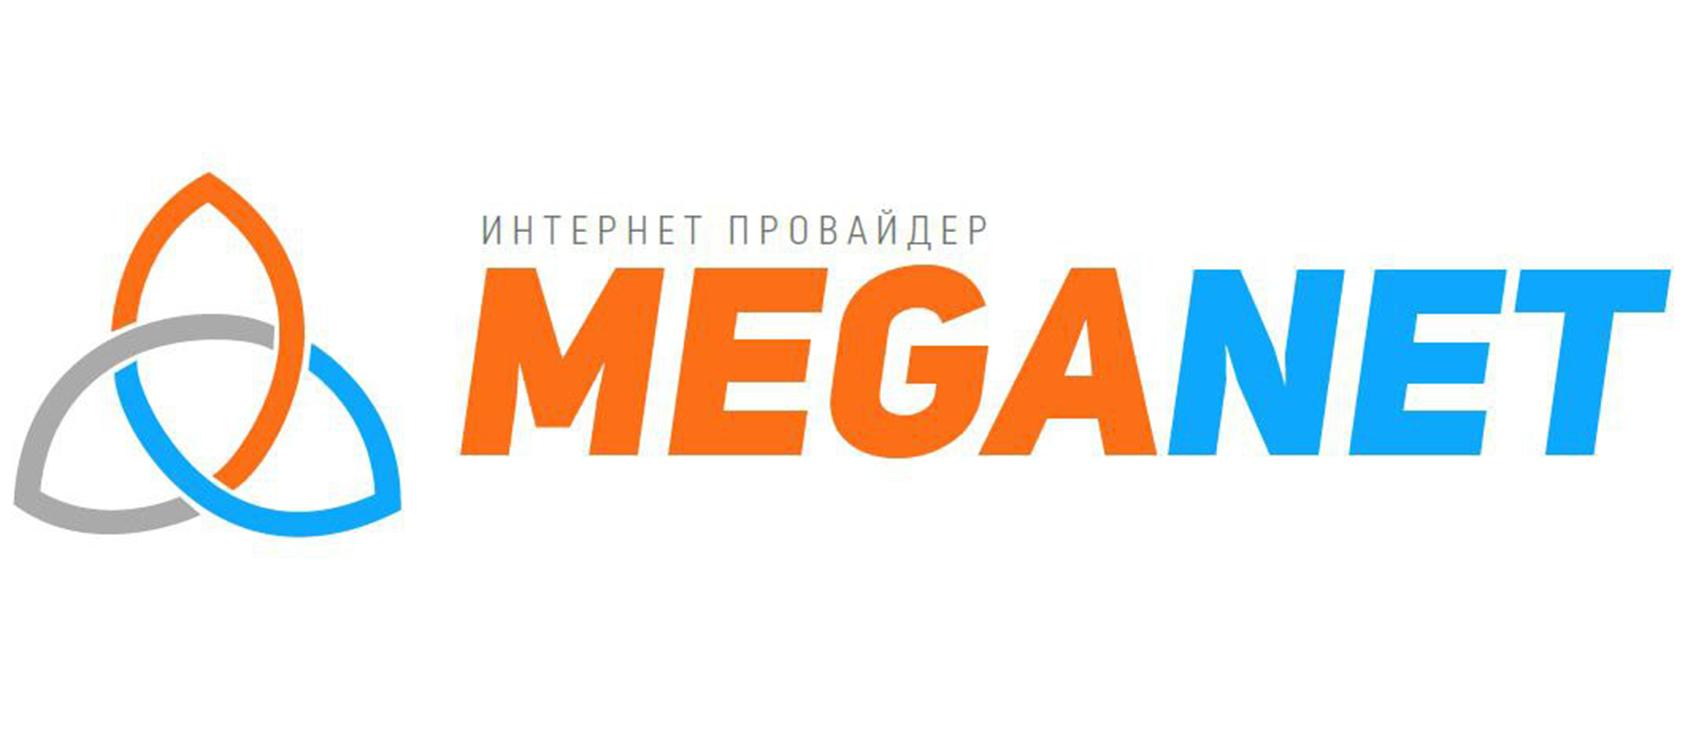 MegaNet  (Чернівецька обл)